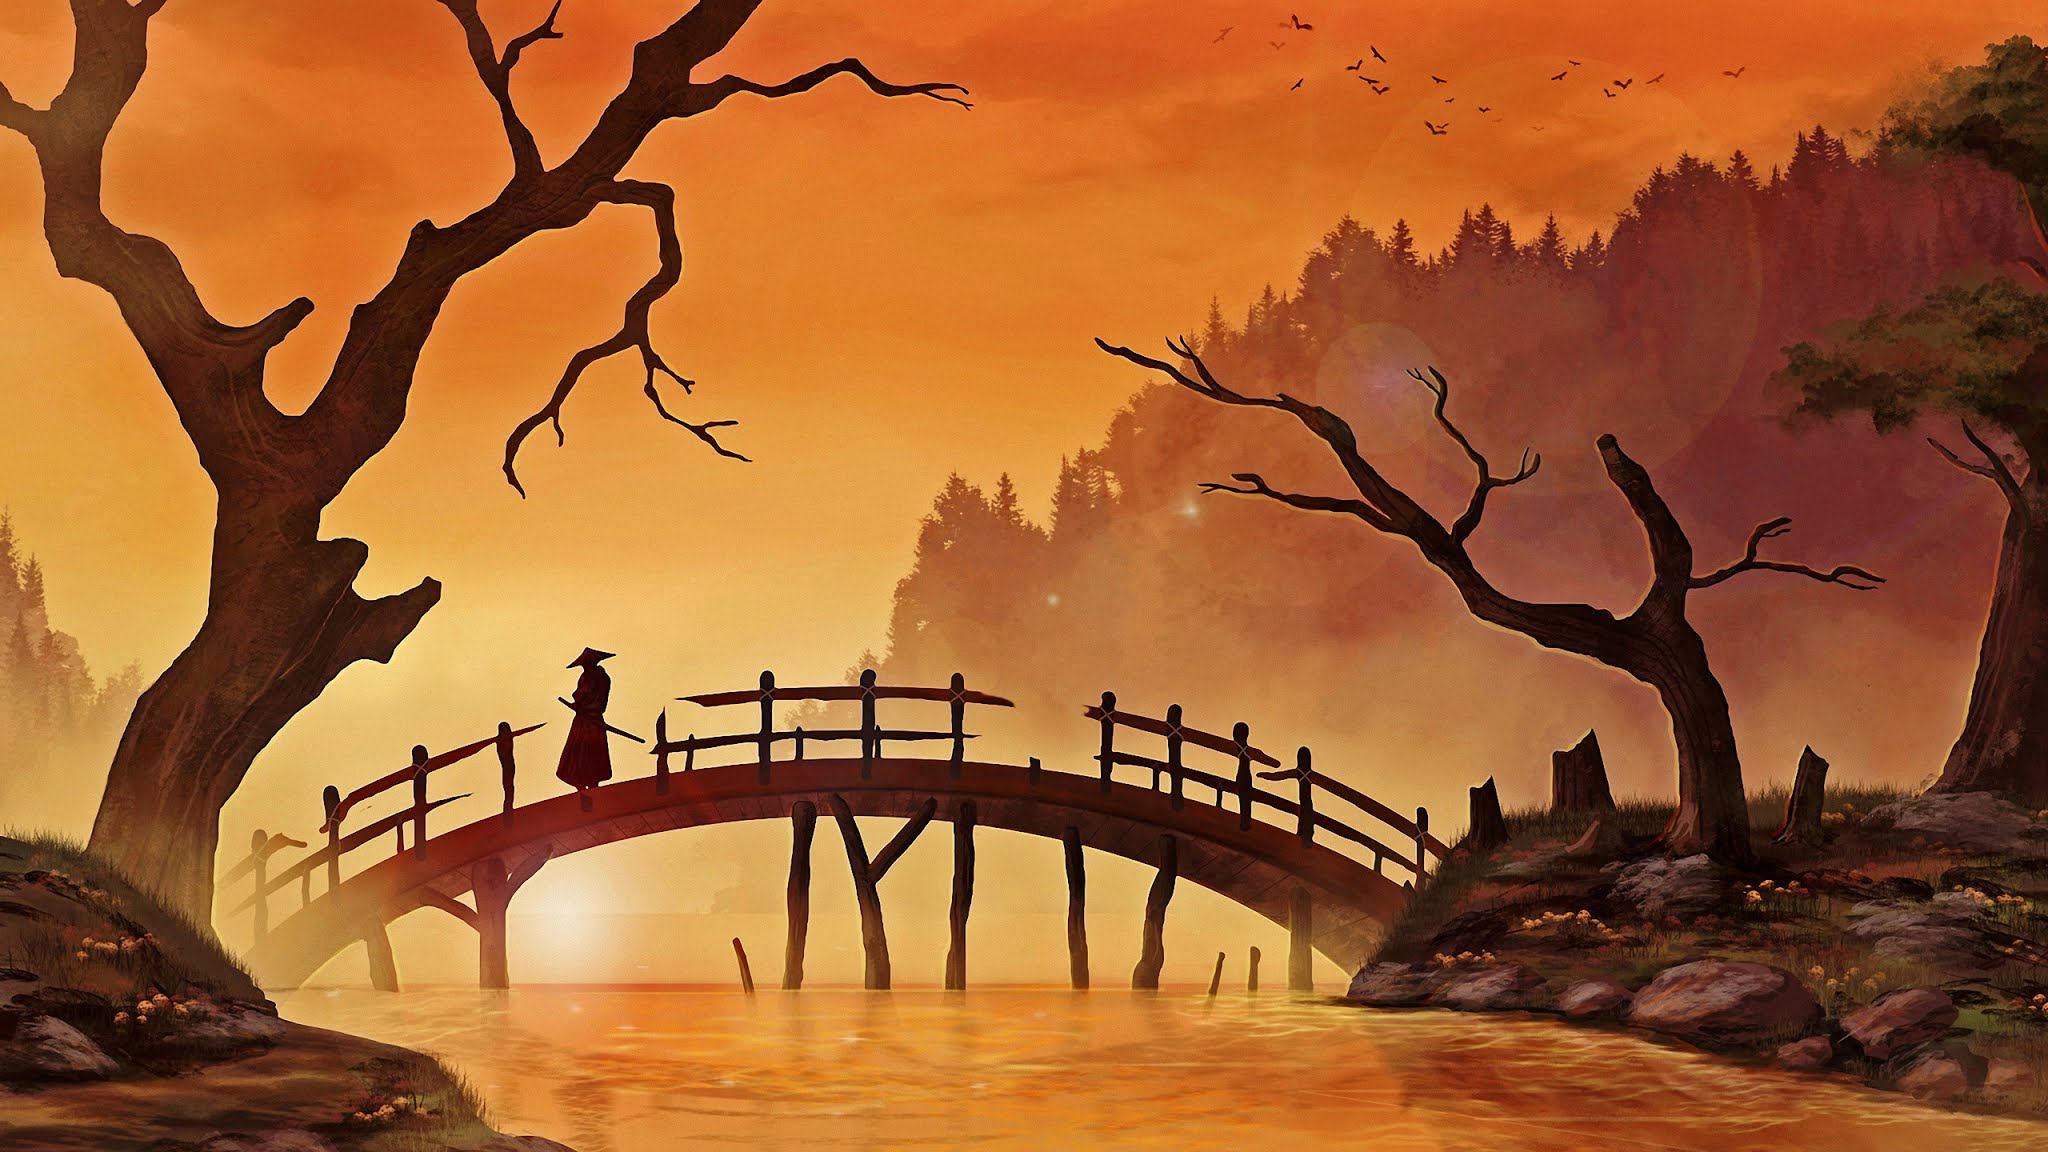 Samurai On Bridge Wallpaper